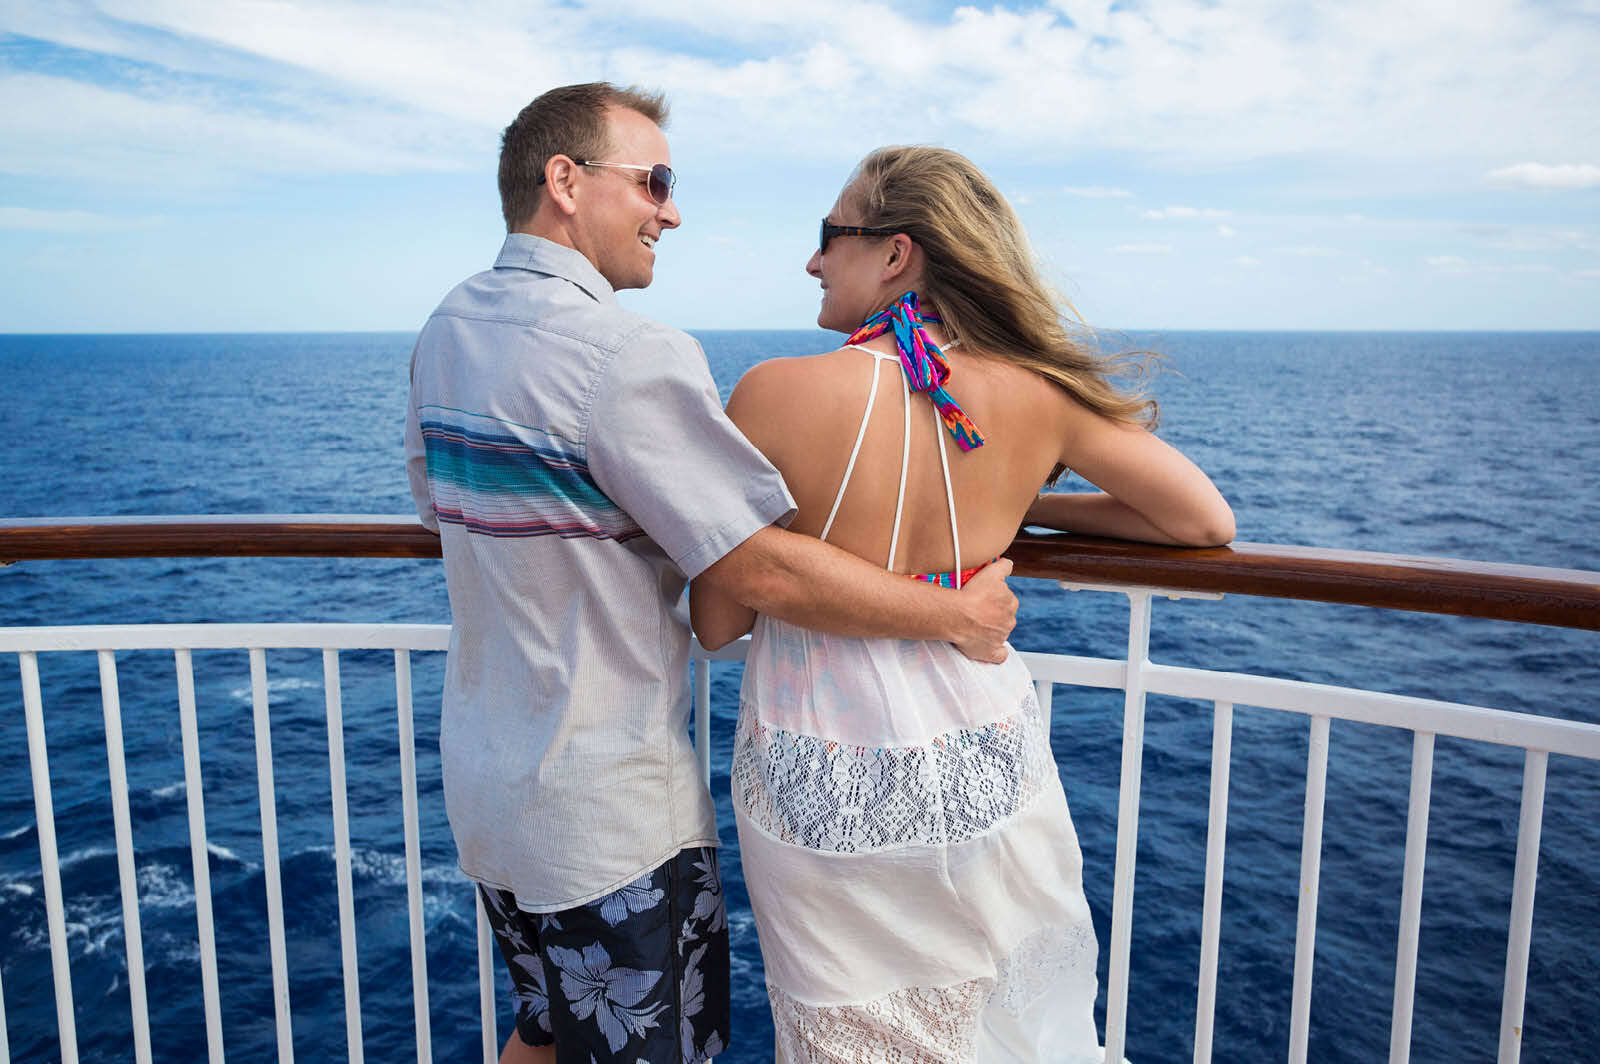 Travelbrands - $50 USD Onboard credit!